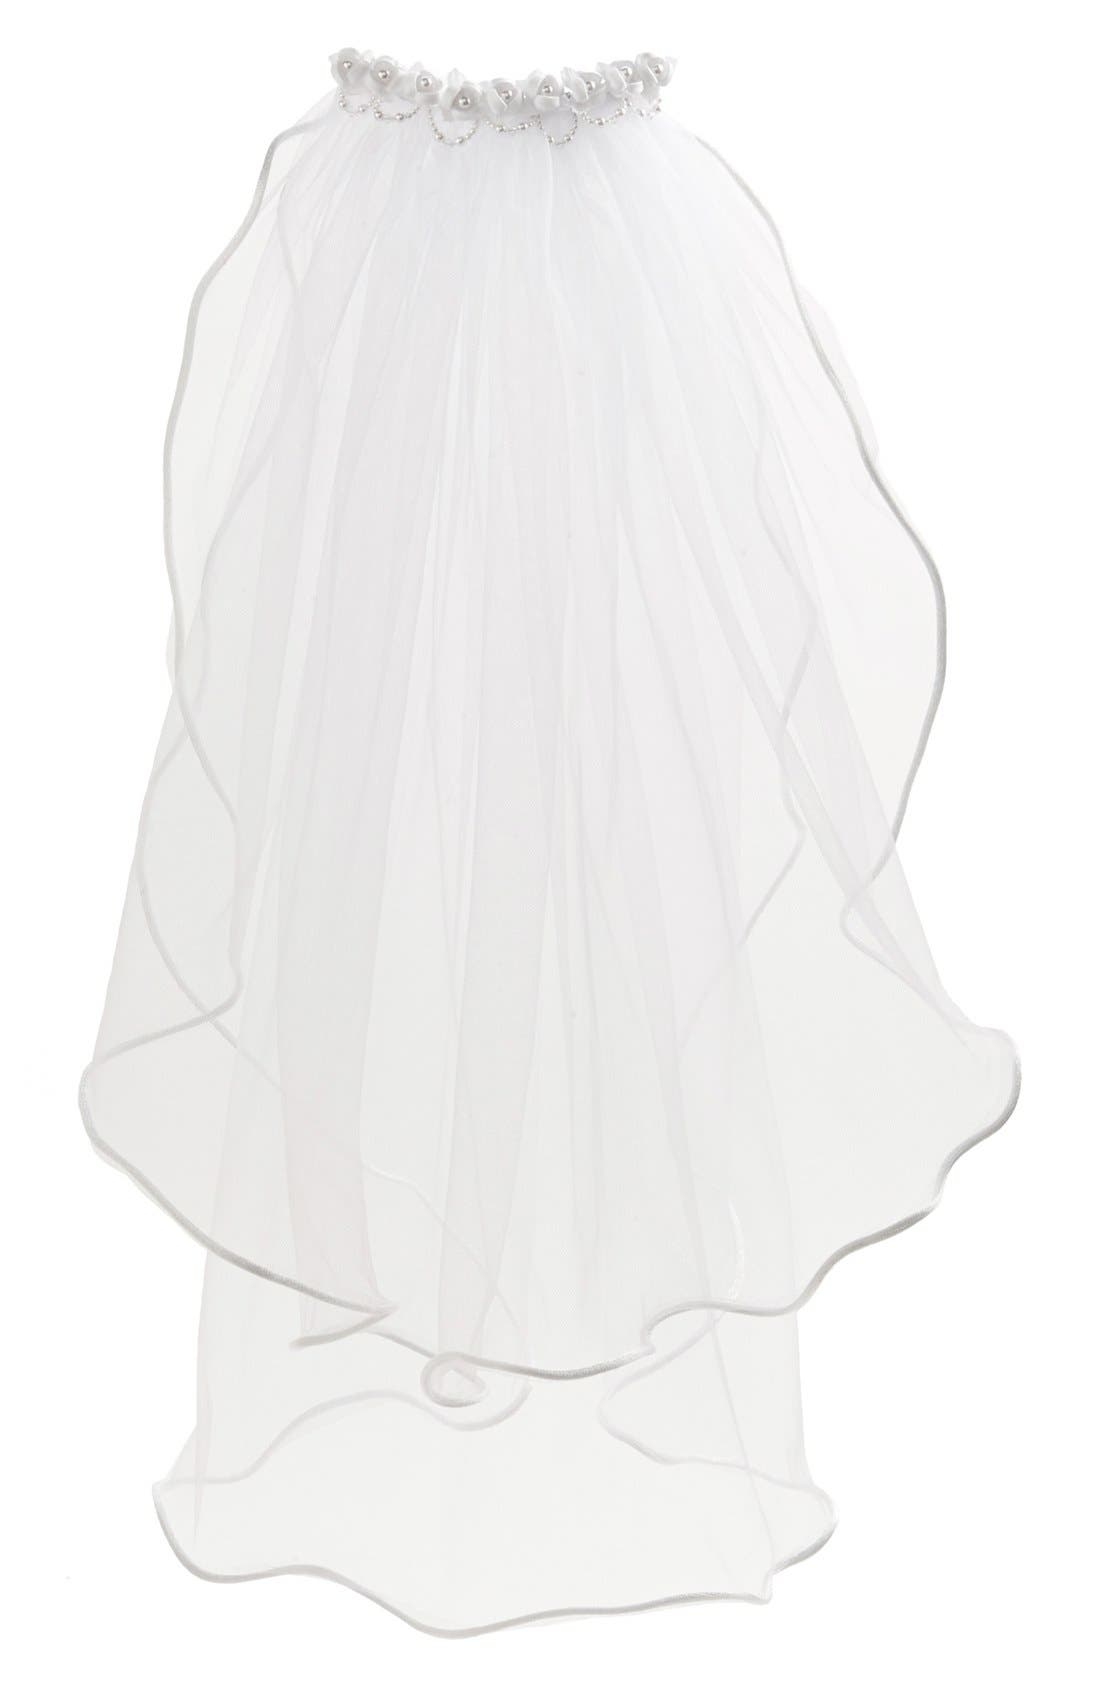 Main Image - Lauren Marie First Communion Veil